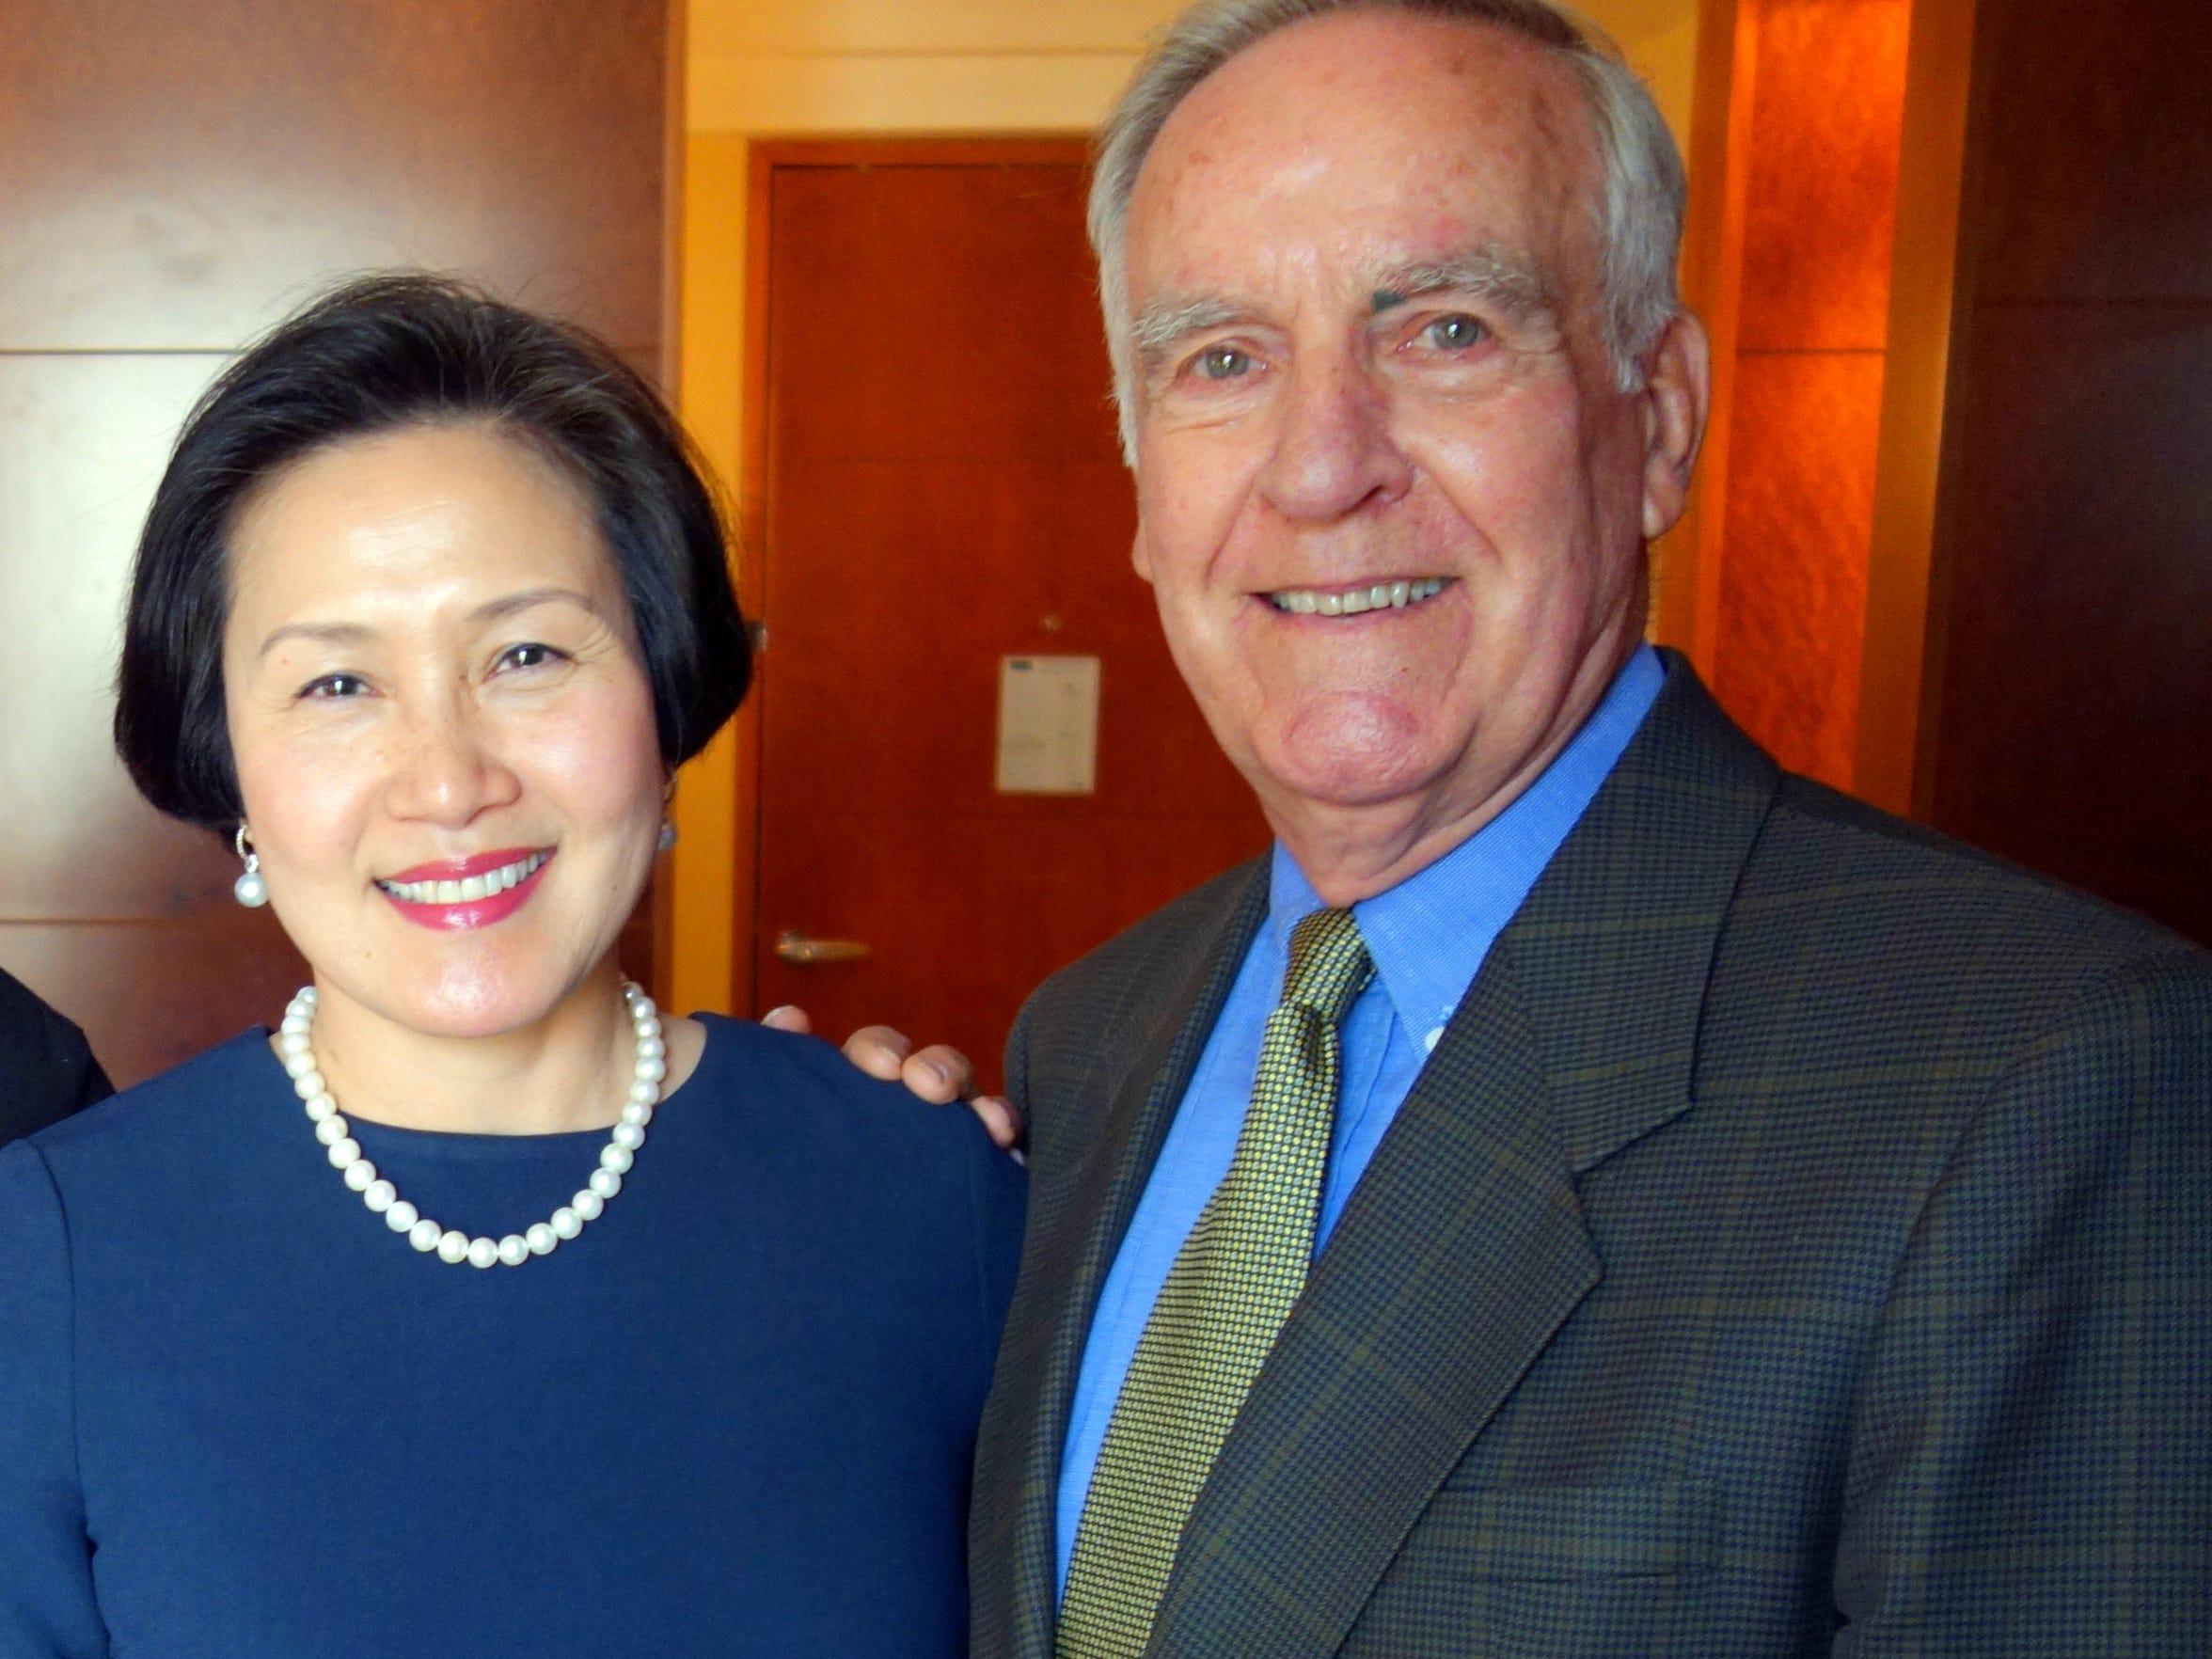 Pete Peterson met Vi Le, a native of Vietnam who was